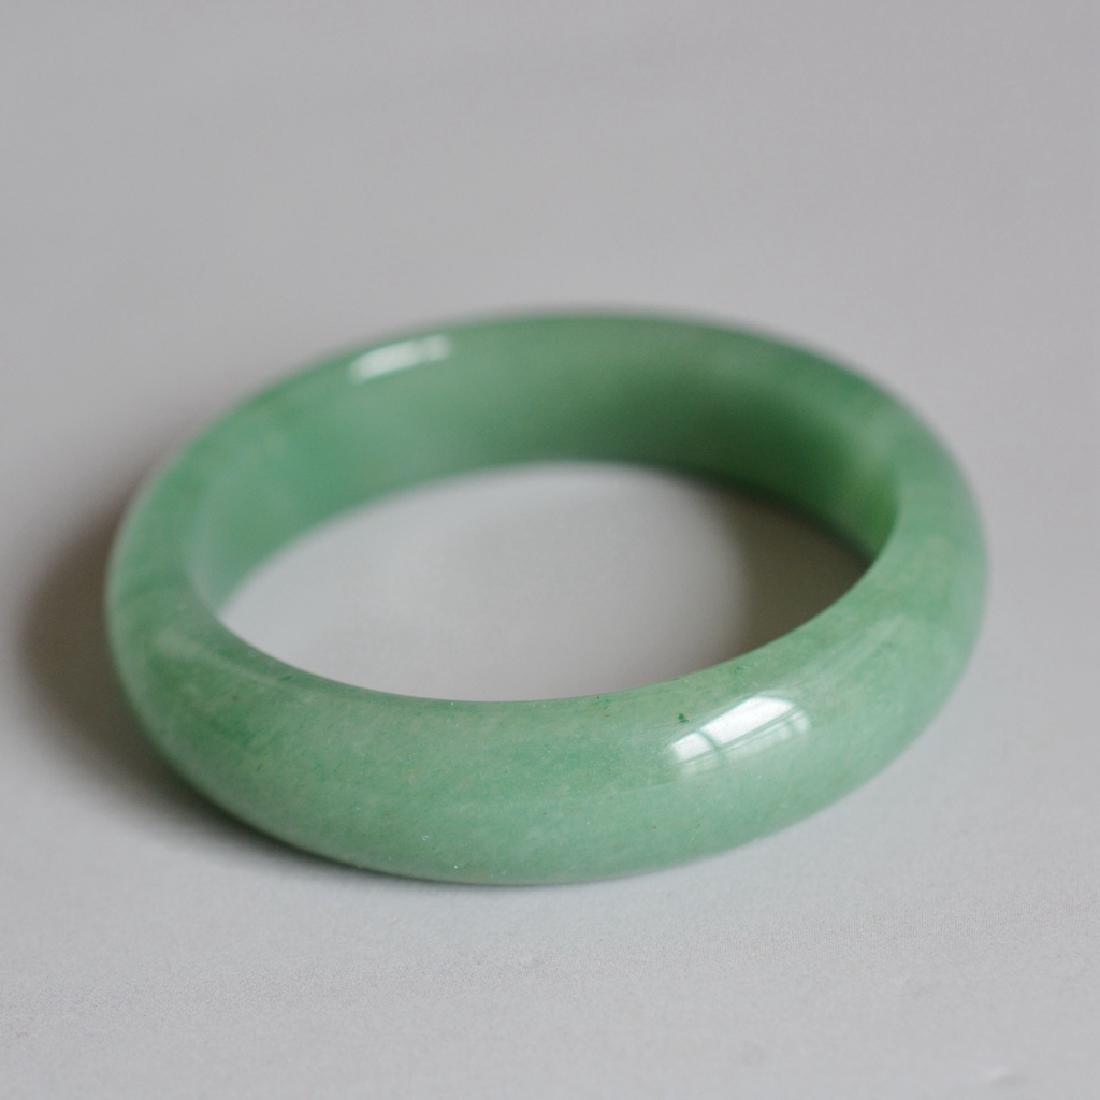 Chinese Carved Jadeite Bracelet - 2